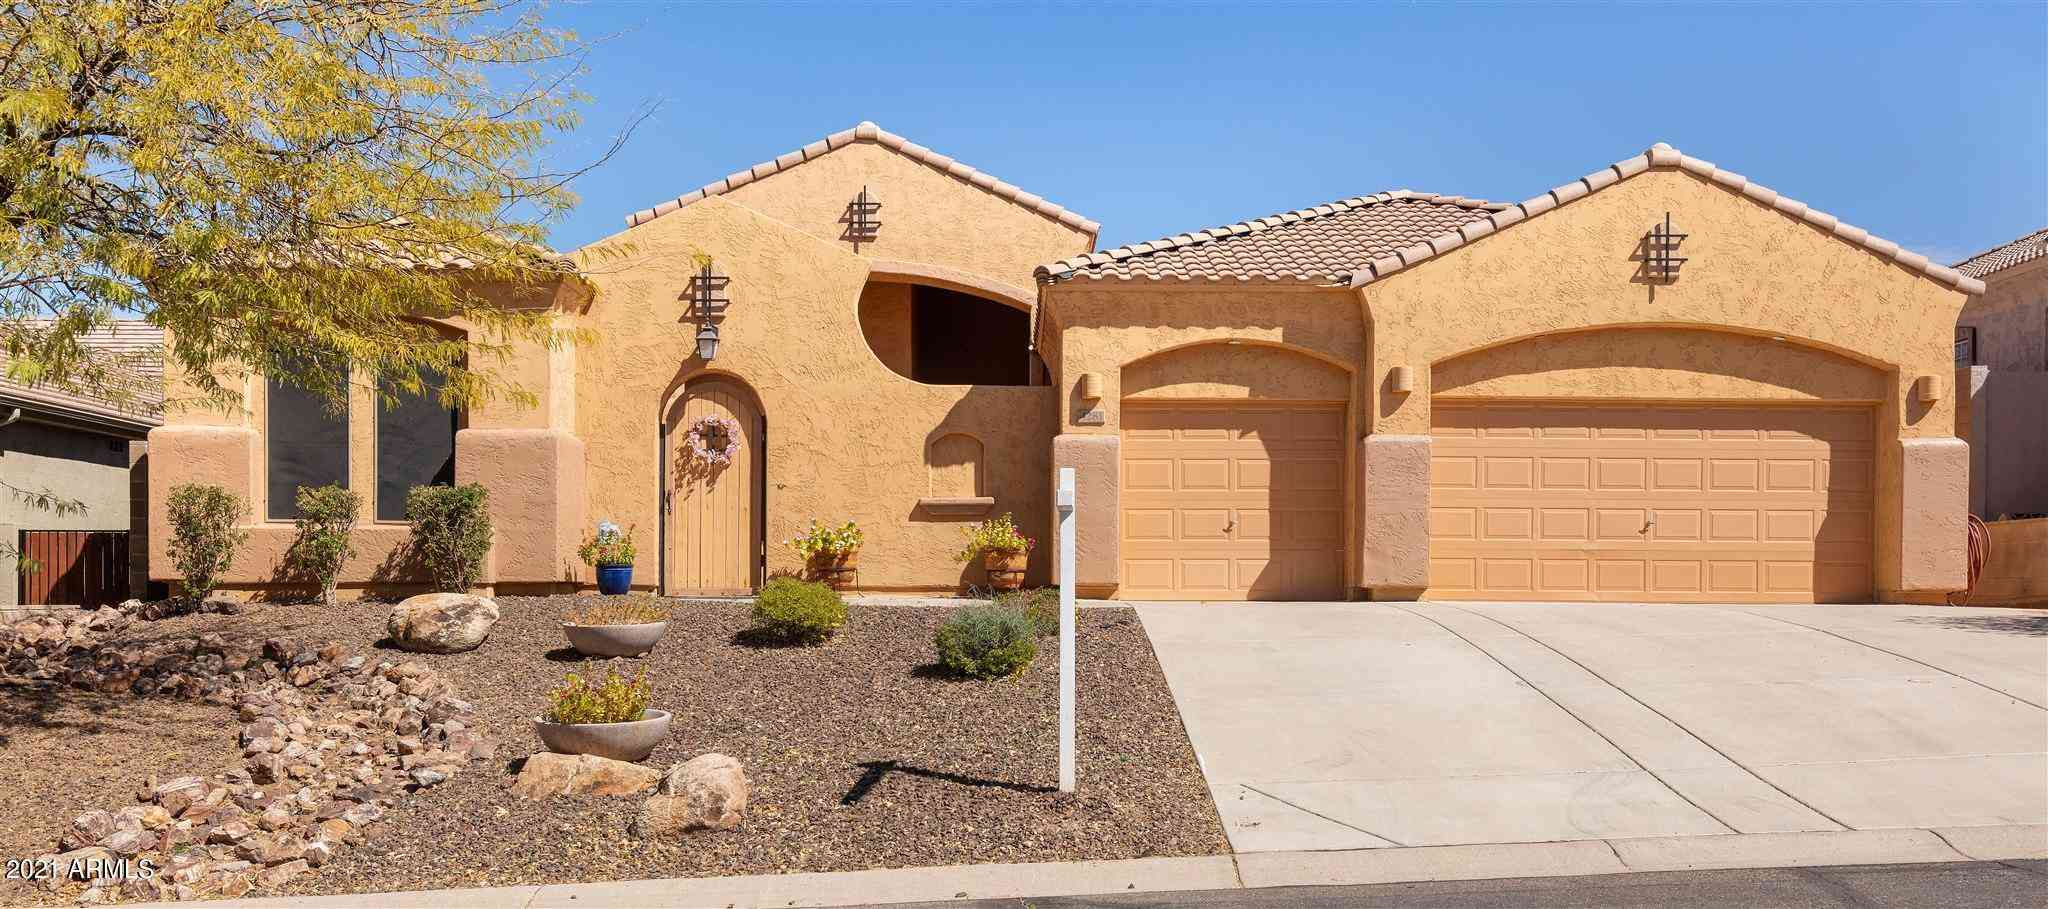 4281 S TECOMA Trail, Gold Canyon, AZ, 85118,